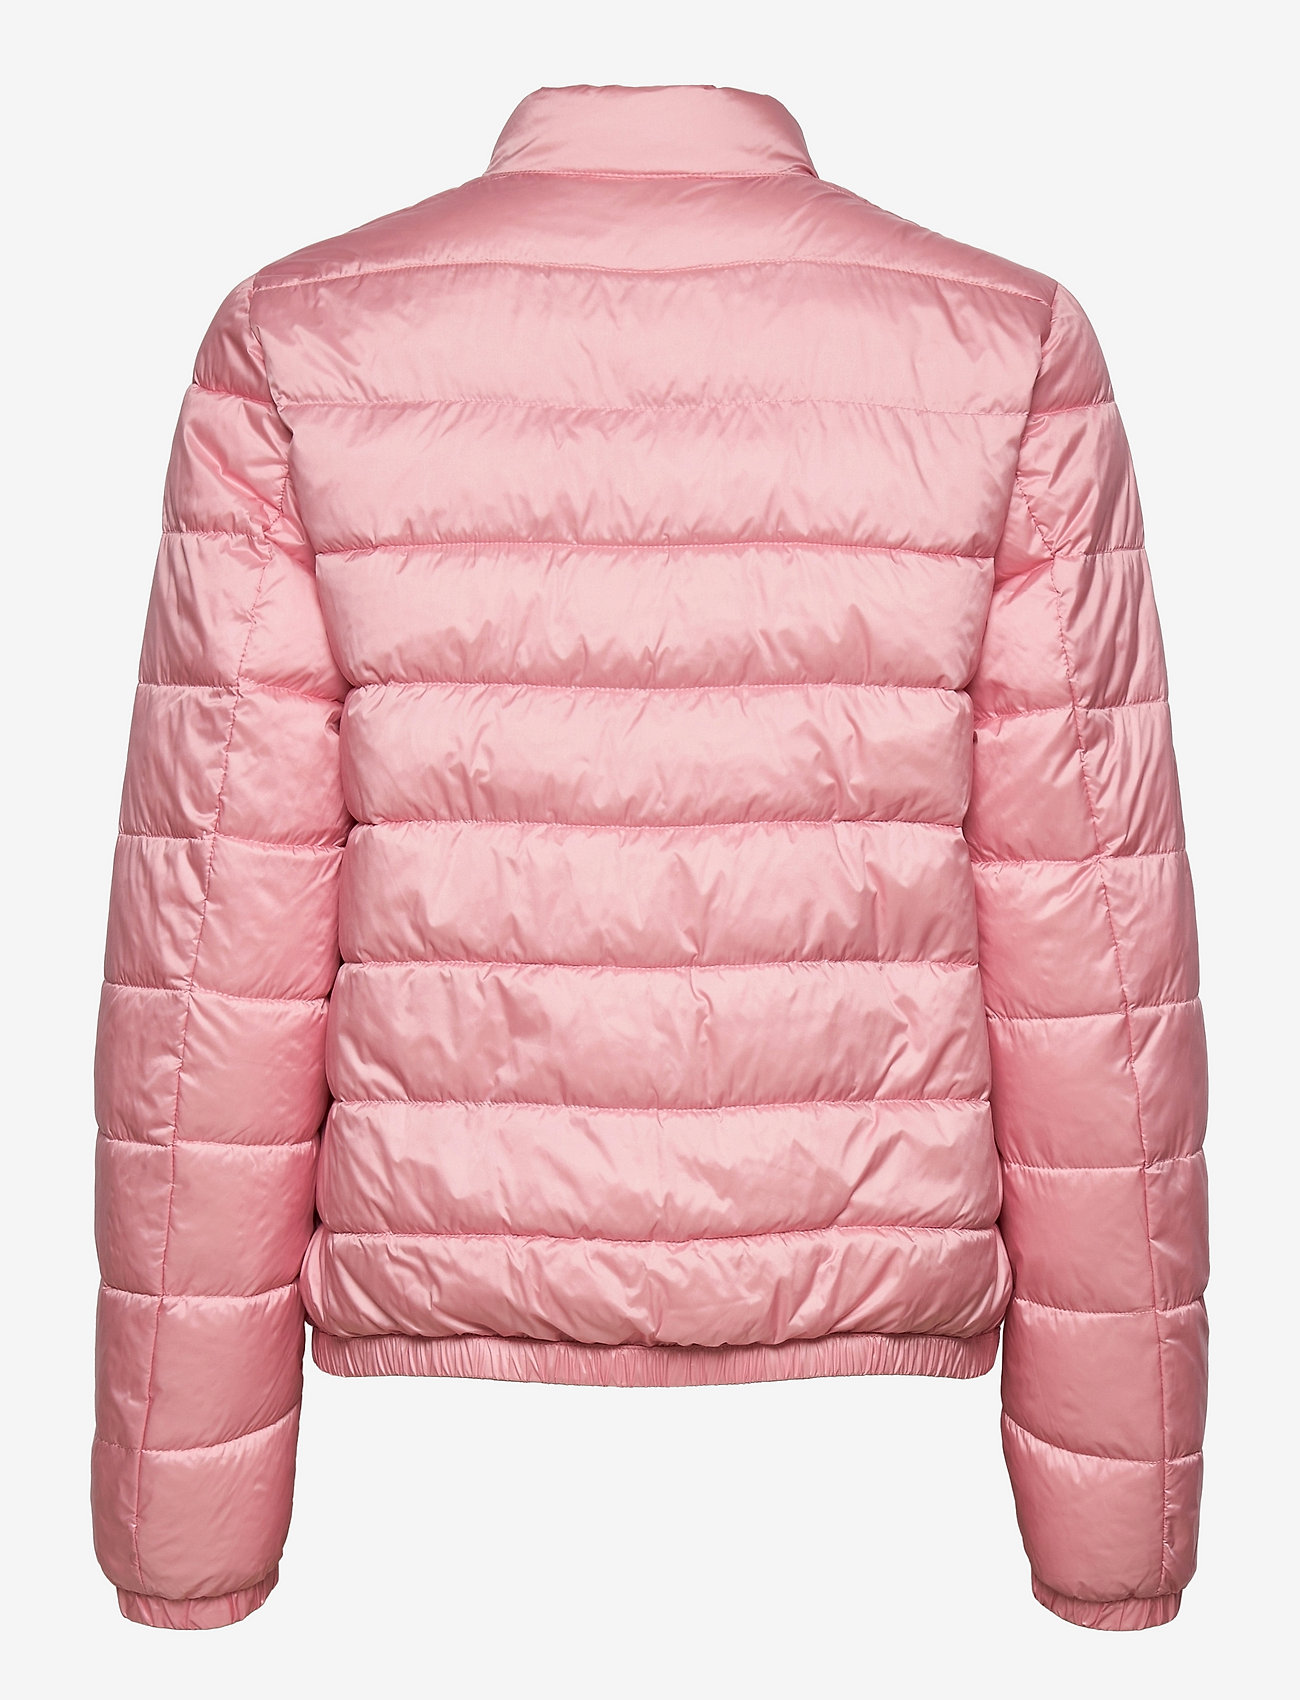 Tommy Hilfiger - NYLON LW PADDED JACKET - winter jackets - glacier pink - 1